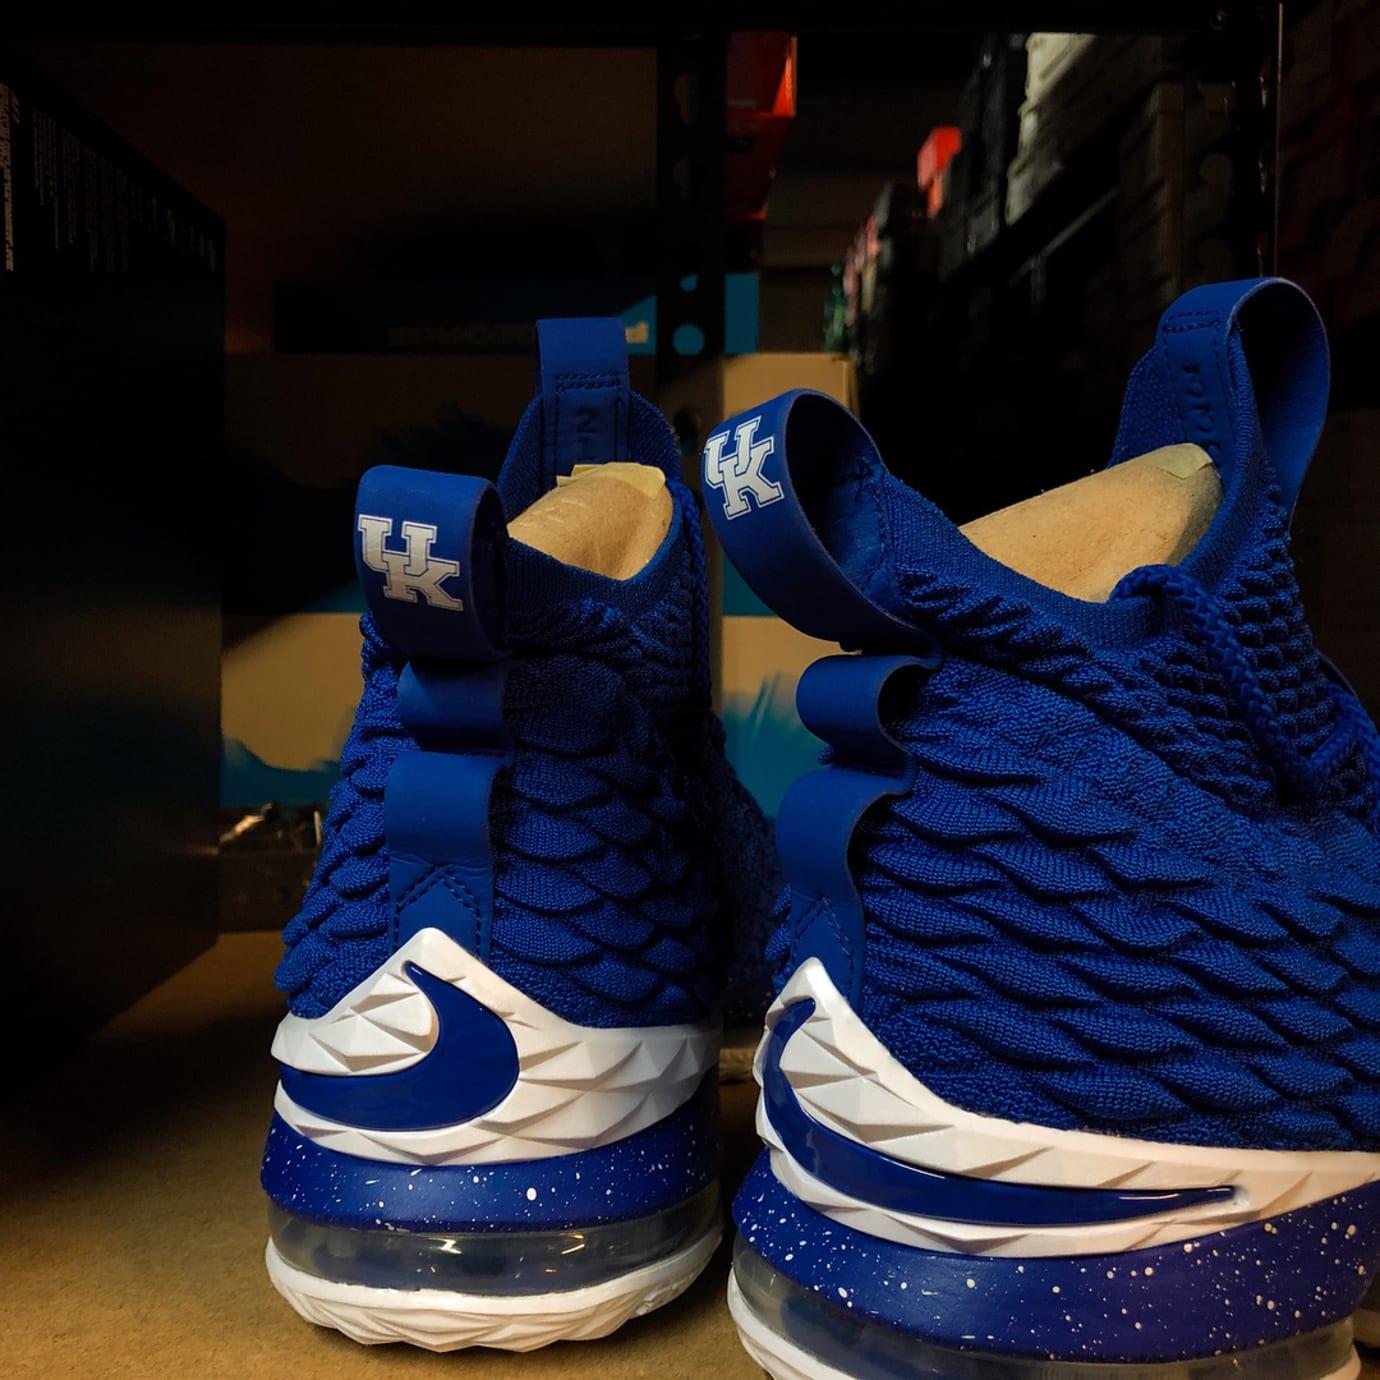 new concept d7fdd 59cc7 Nike LeBron 15 Kentucky PE | Sole Collector